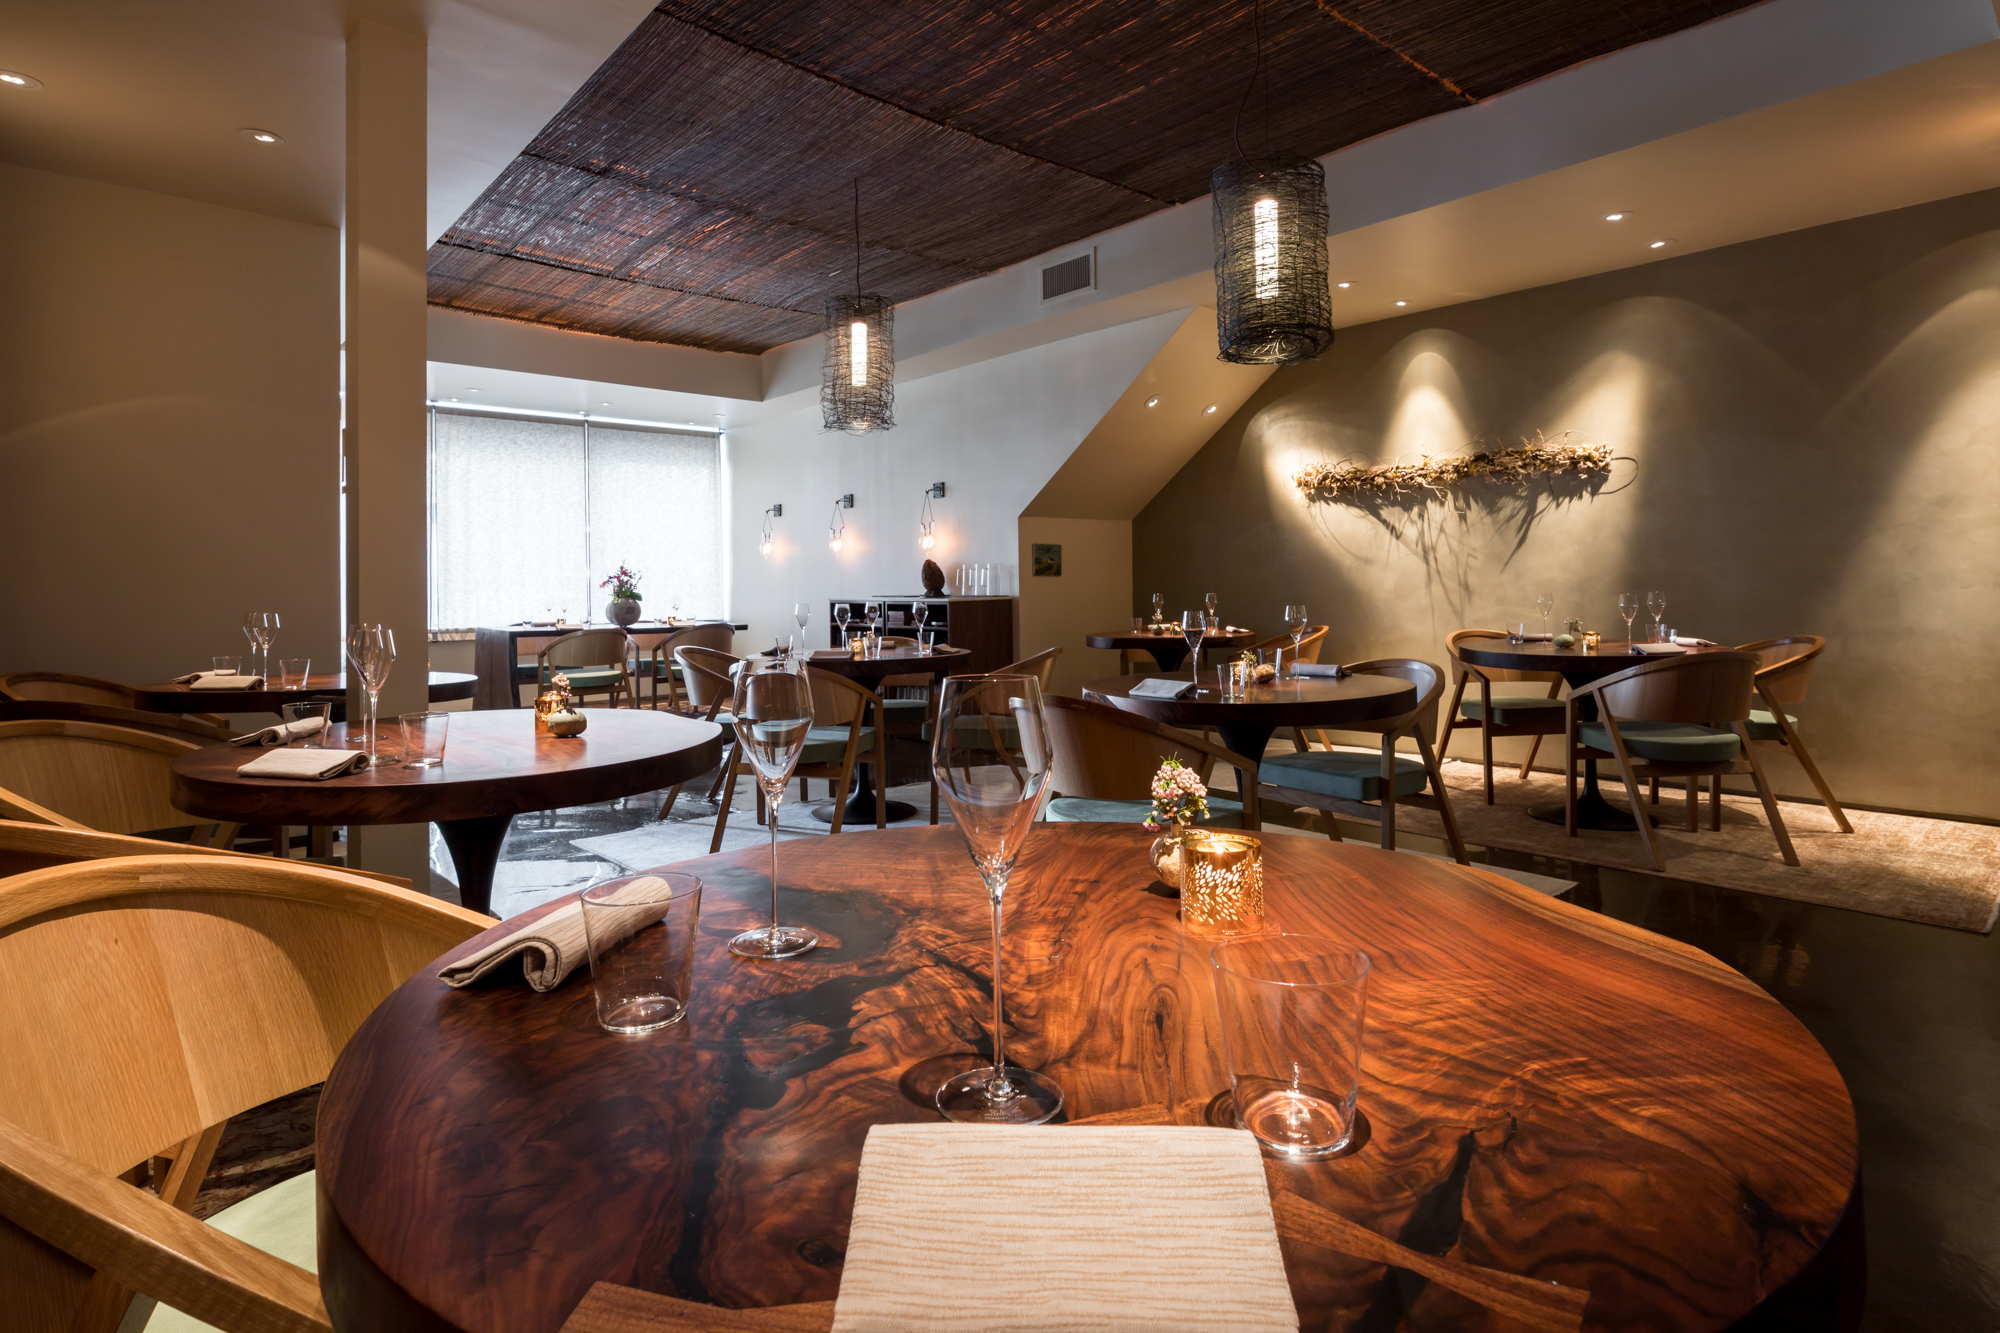 Atelier crenn restaurant san francisco ca opentable for Atelier cuisine vevey